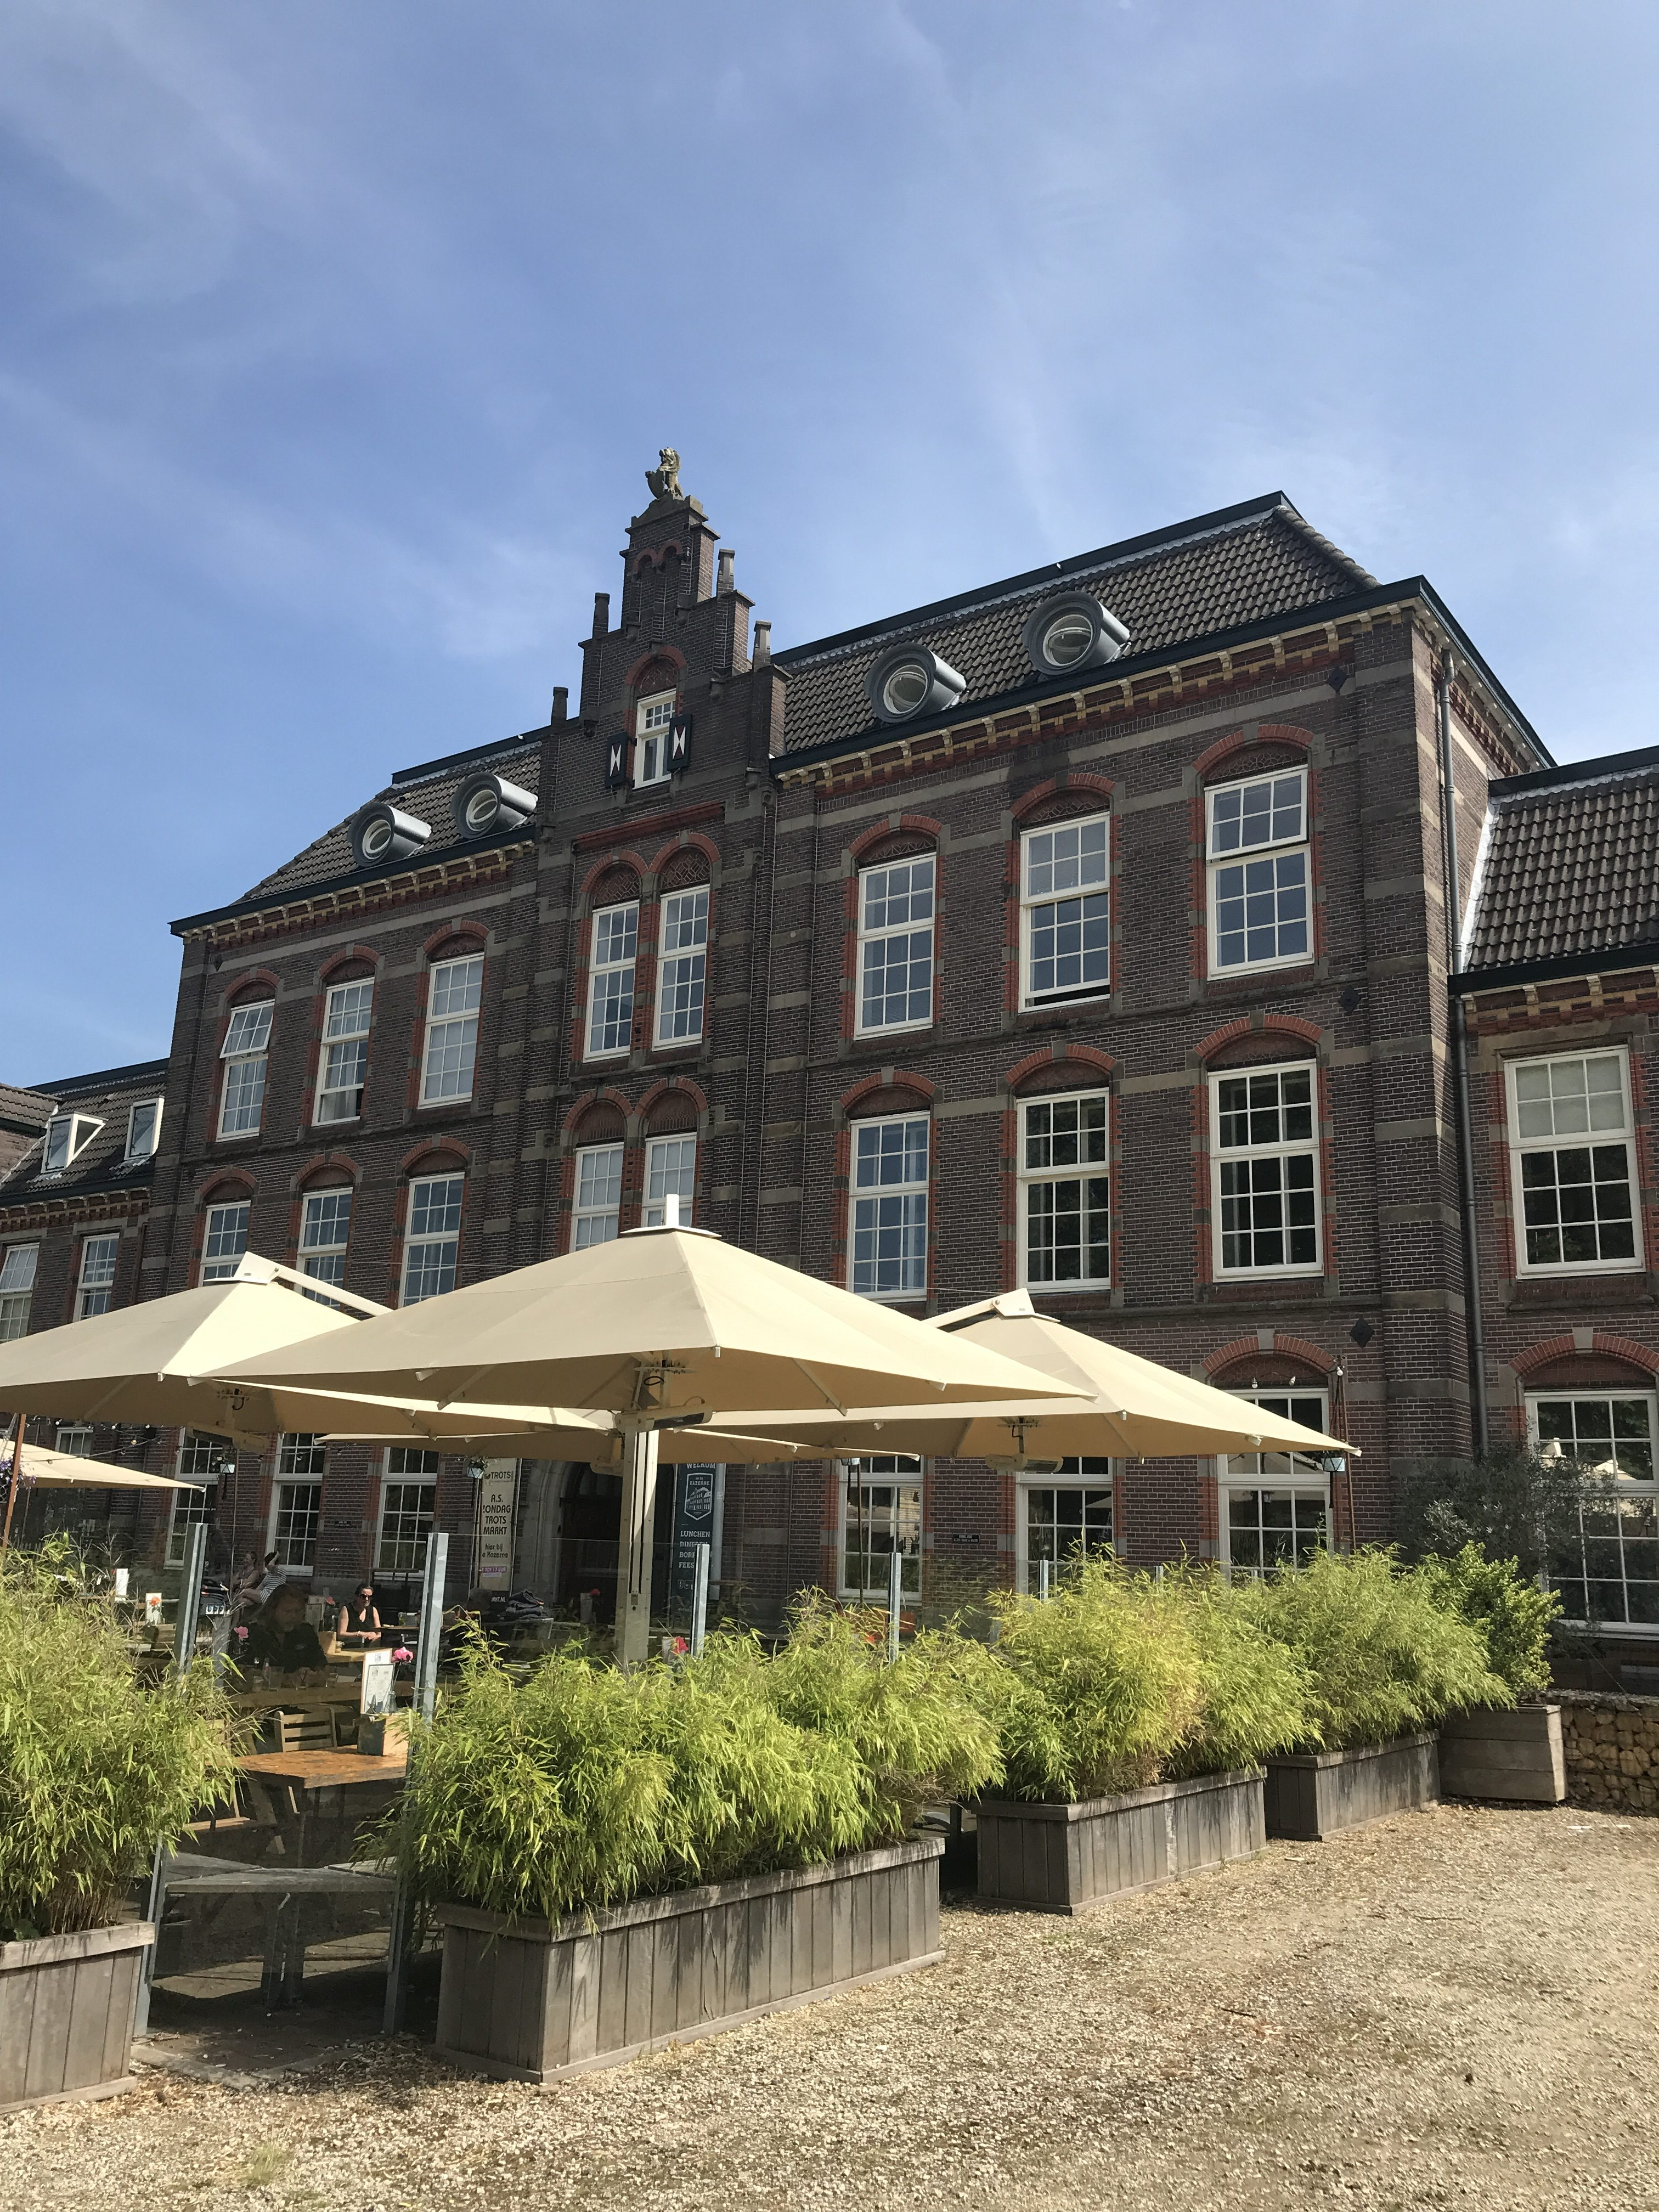 Maiden Magazine in de kazerne hotspot Nijmegen voorkant limos terras